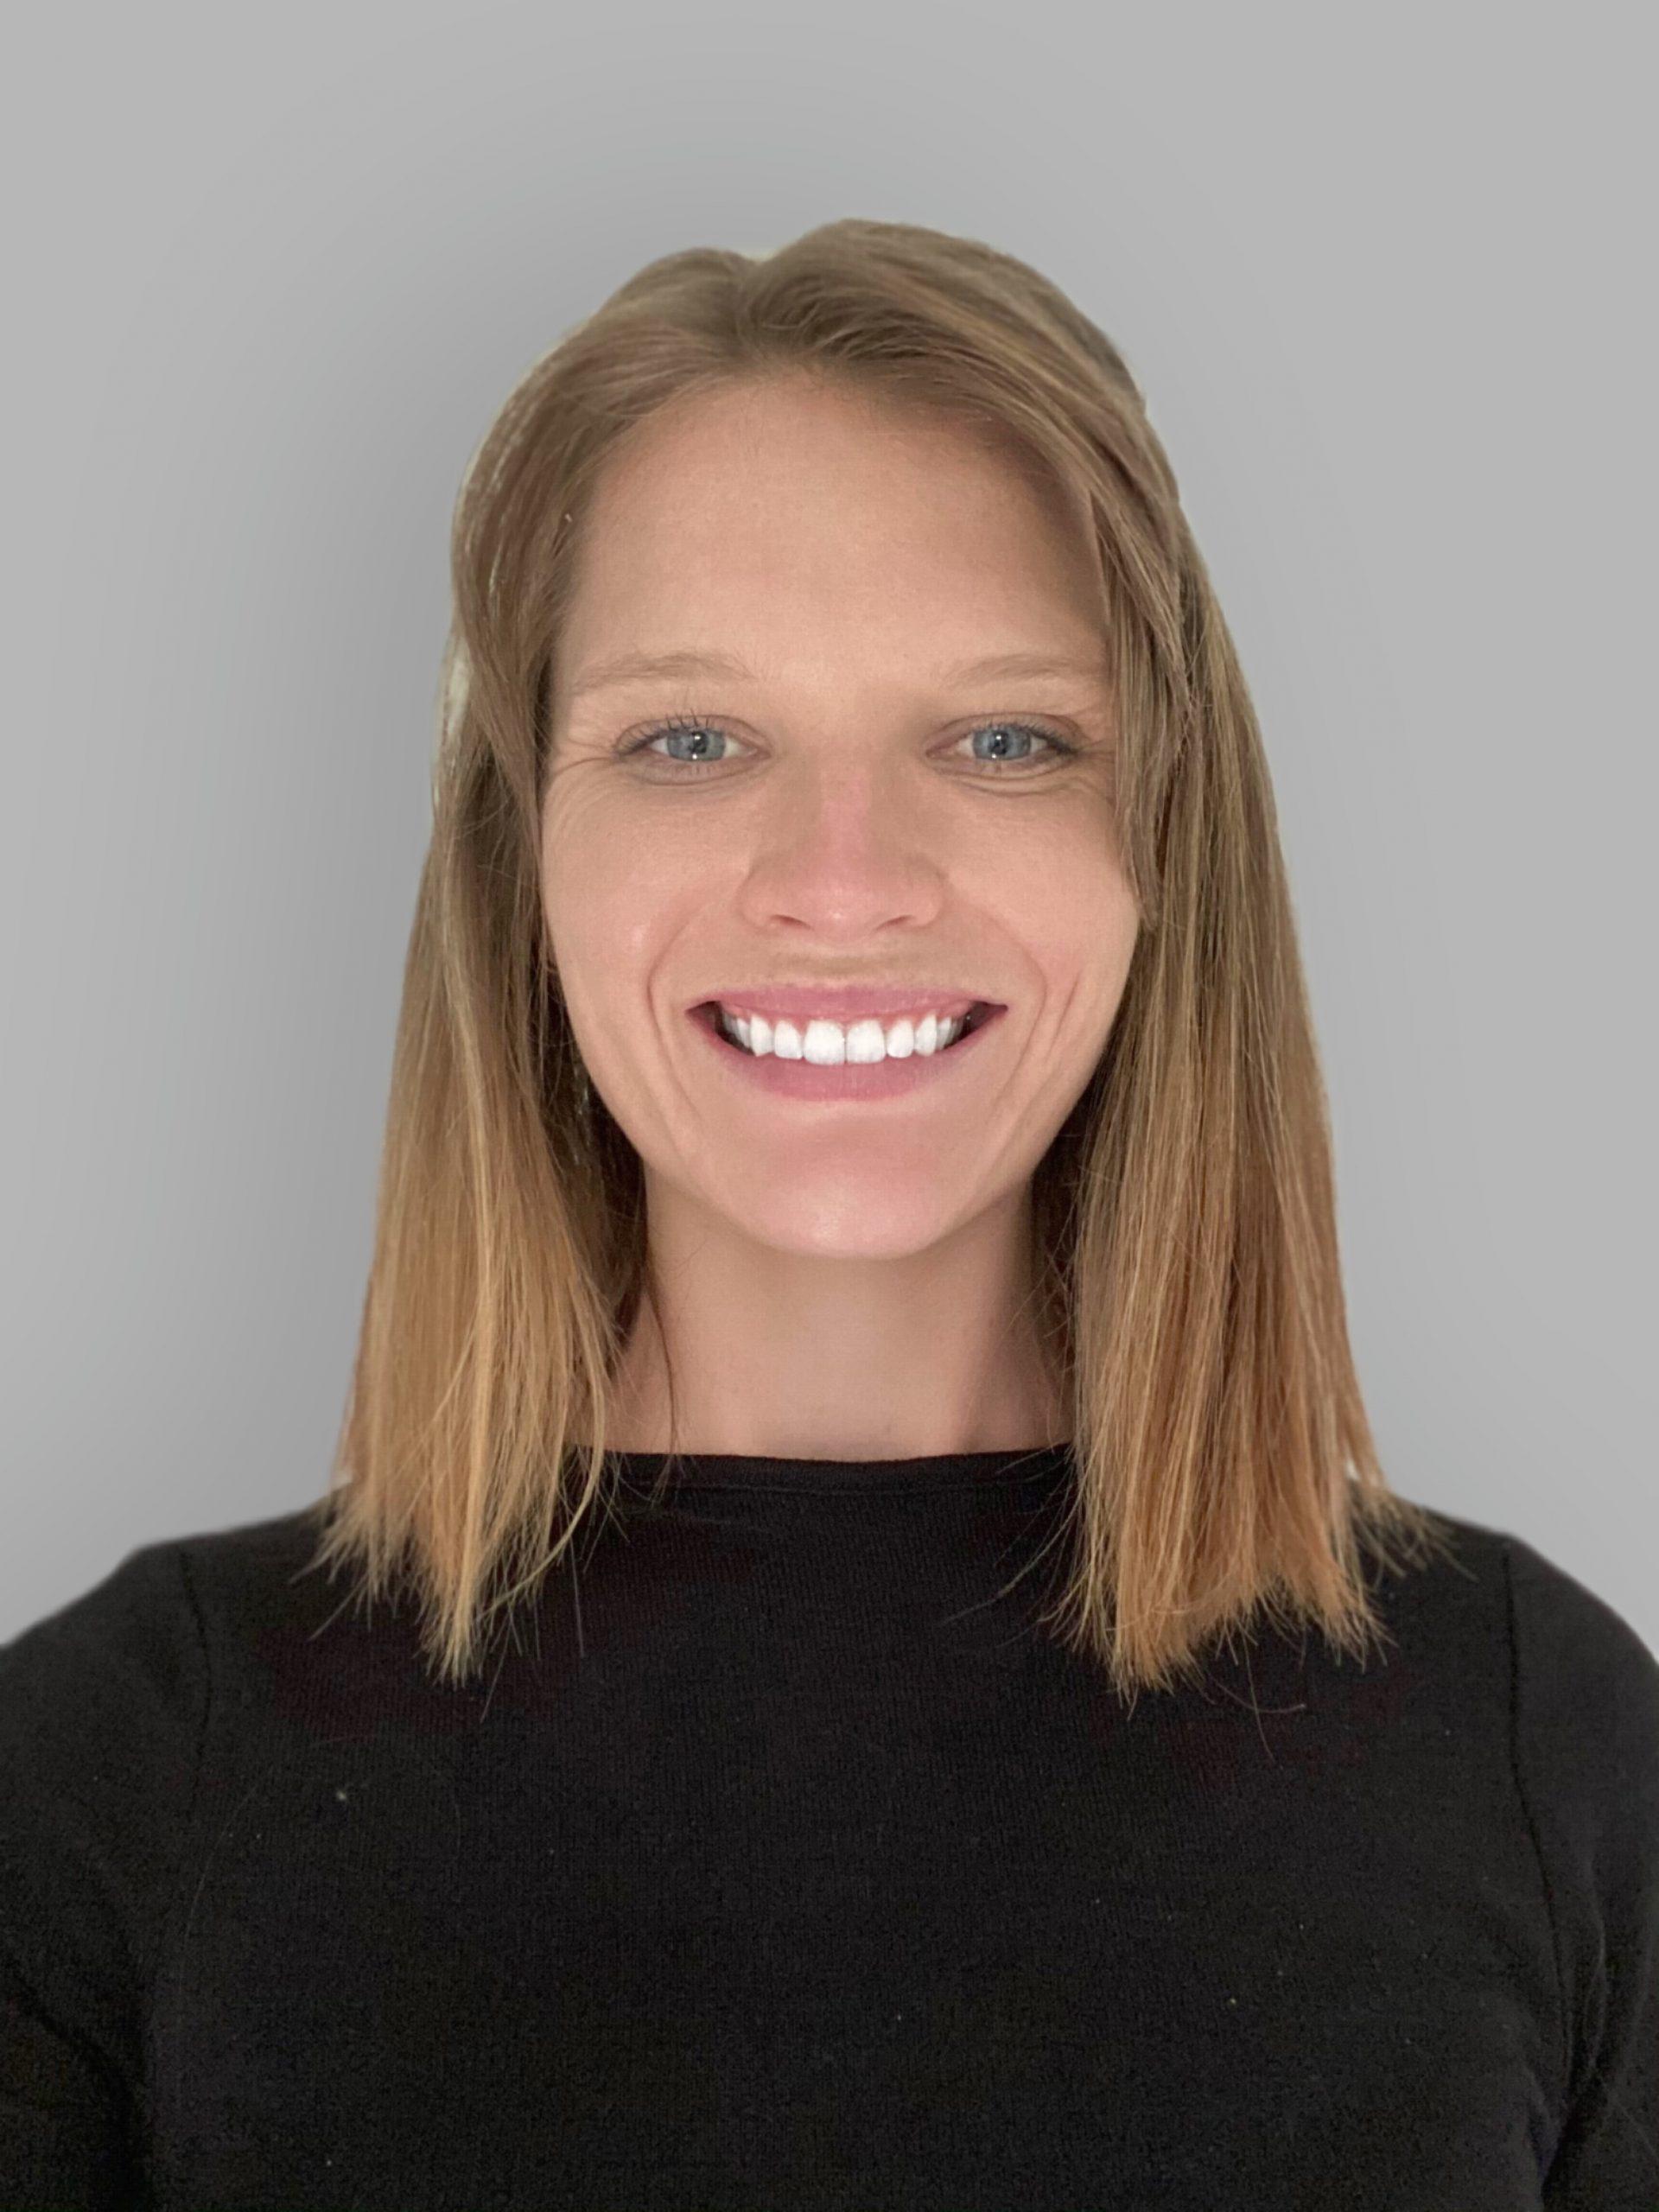 Lauren Couch, Broadmeadow, NSW, ORS